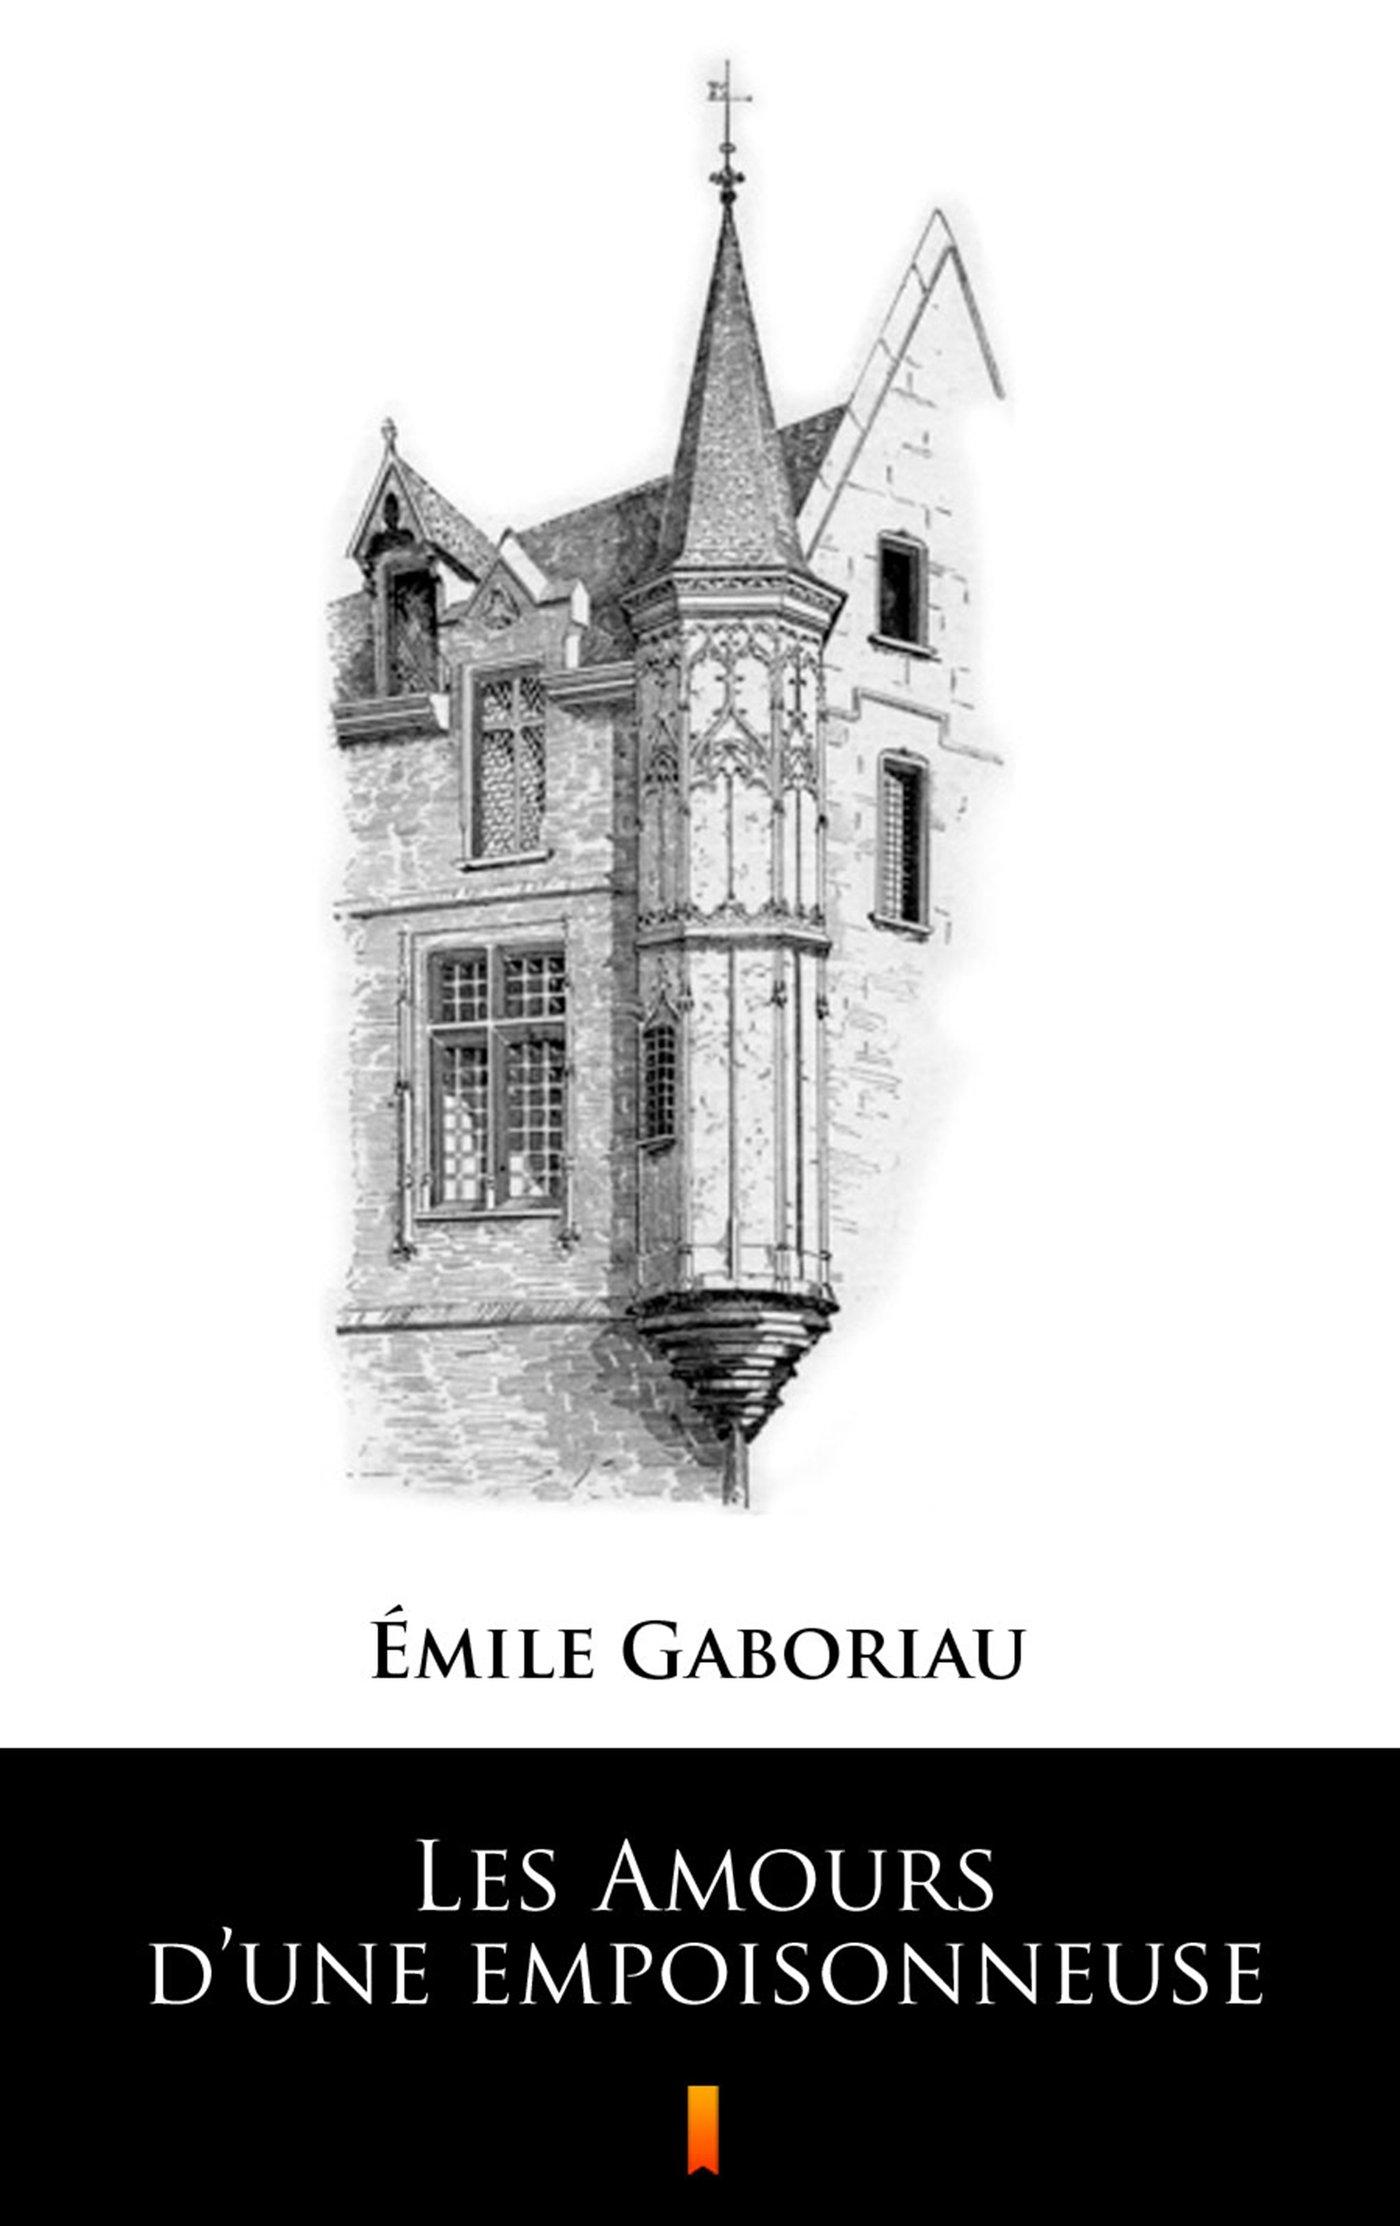 Les Amours d'une empoisonneuse - Ebook (Książka EPUB) do pobrania w formacie EPUB